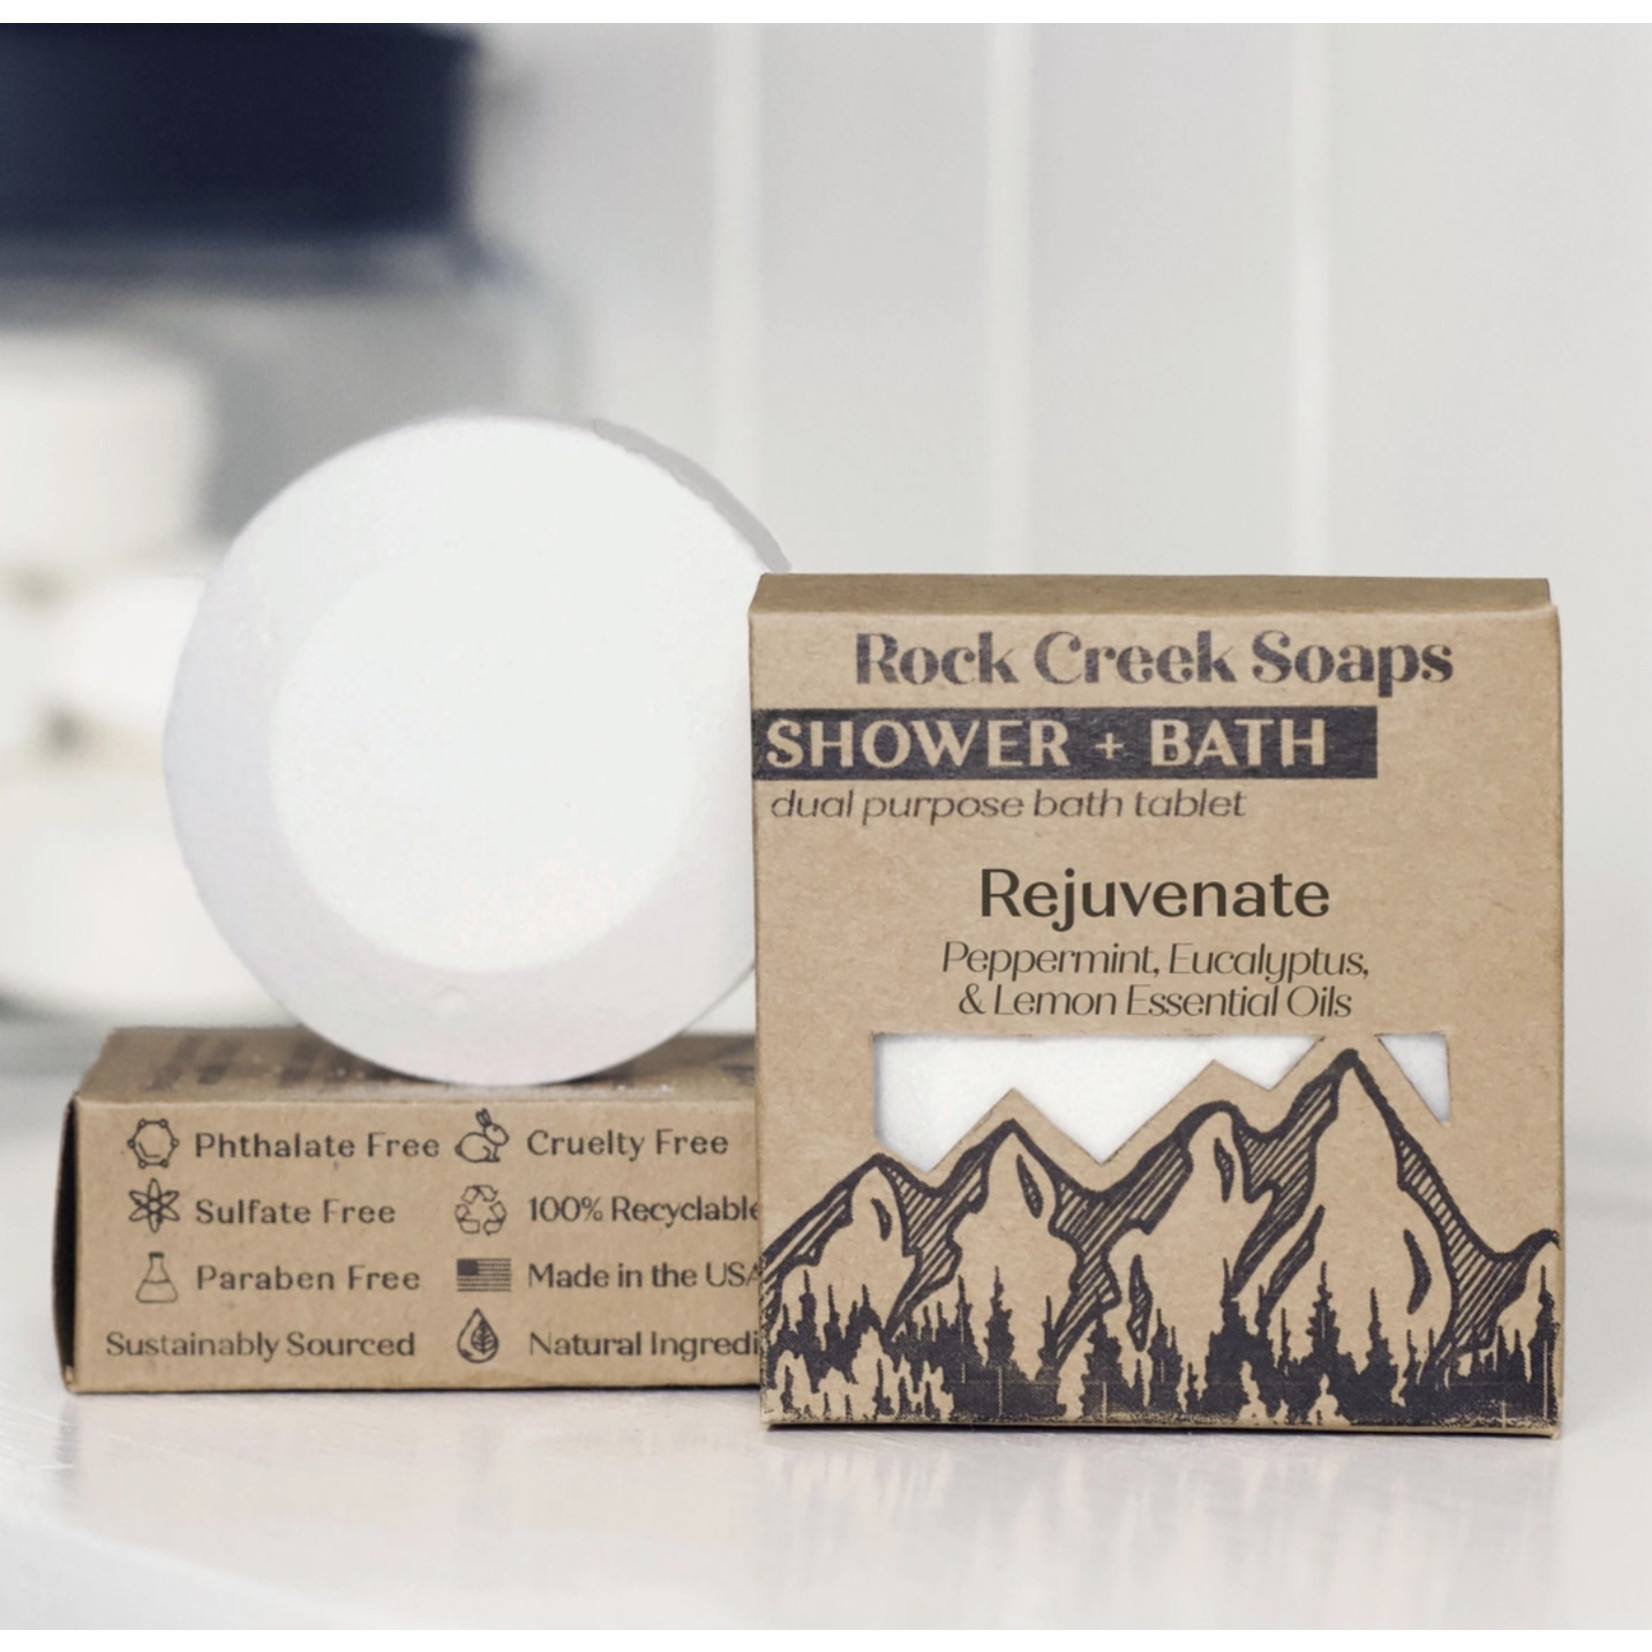 Rock Creek Soaps SHOWER + BATH | Single Tablet: